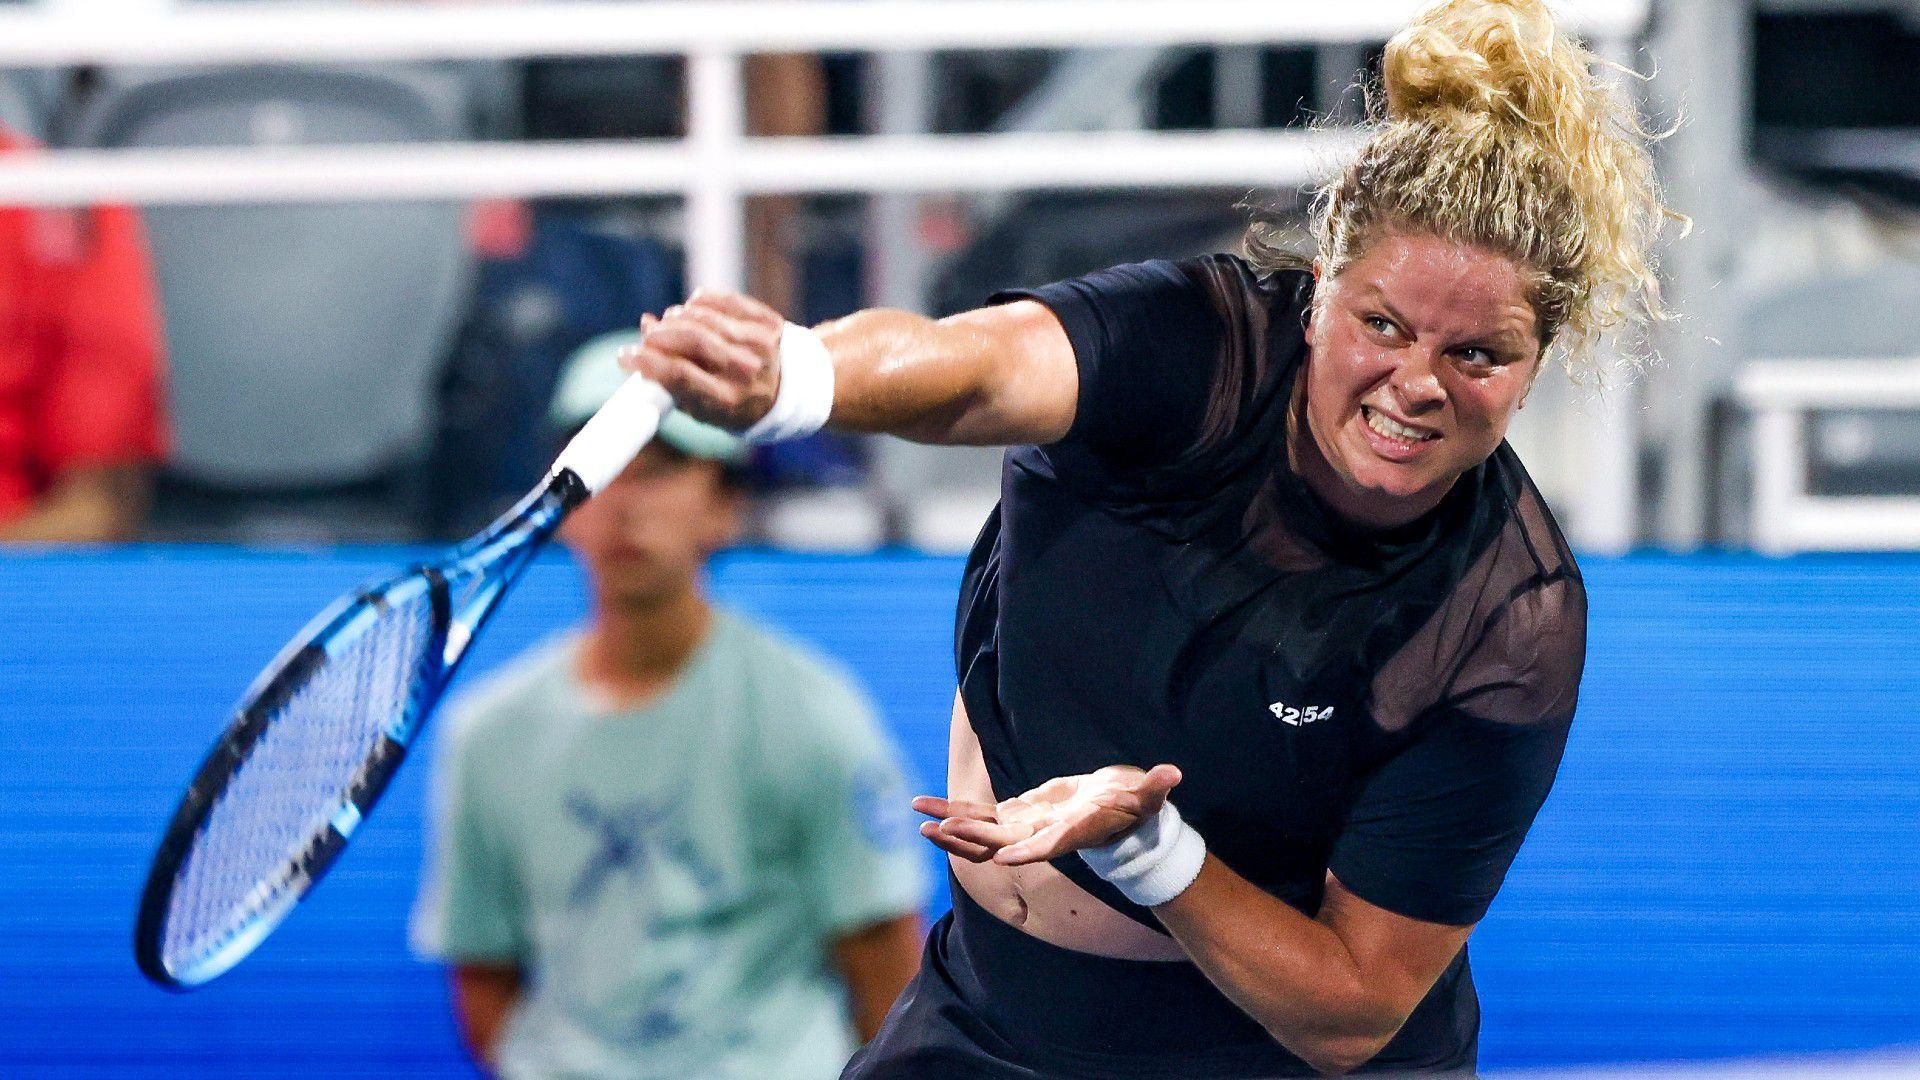 Winless since 2012, tennis legend makes comeback